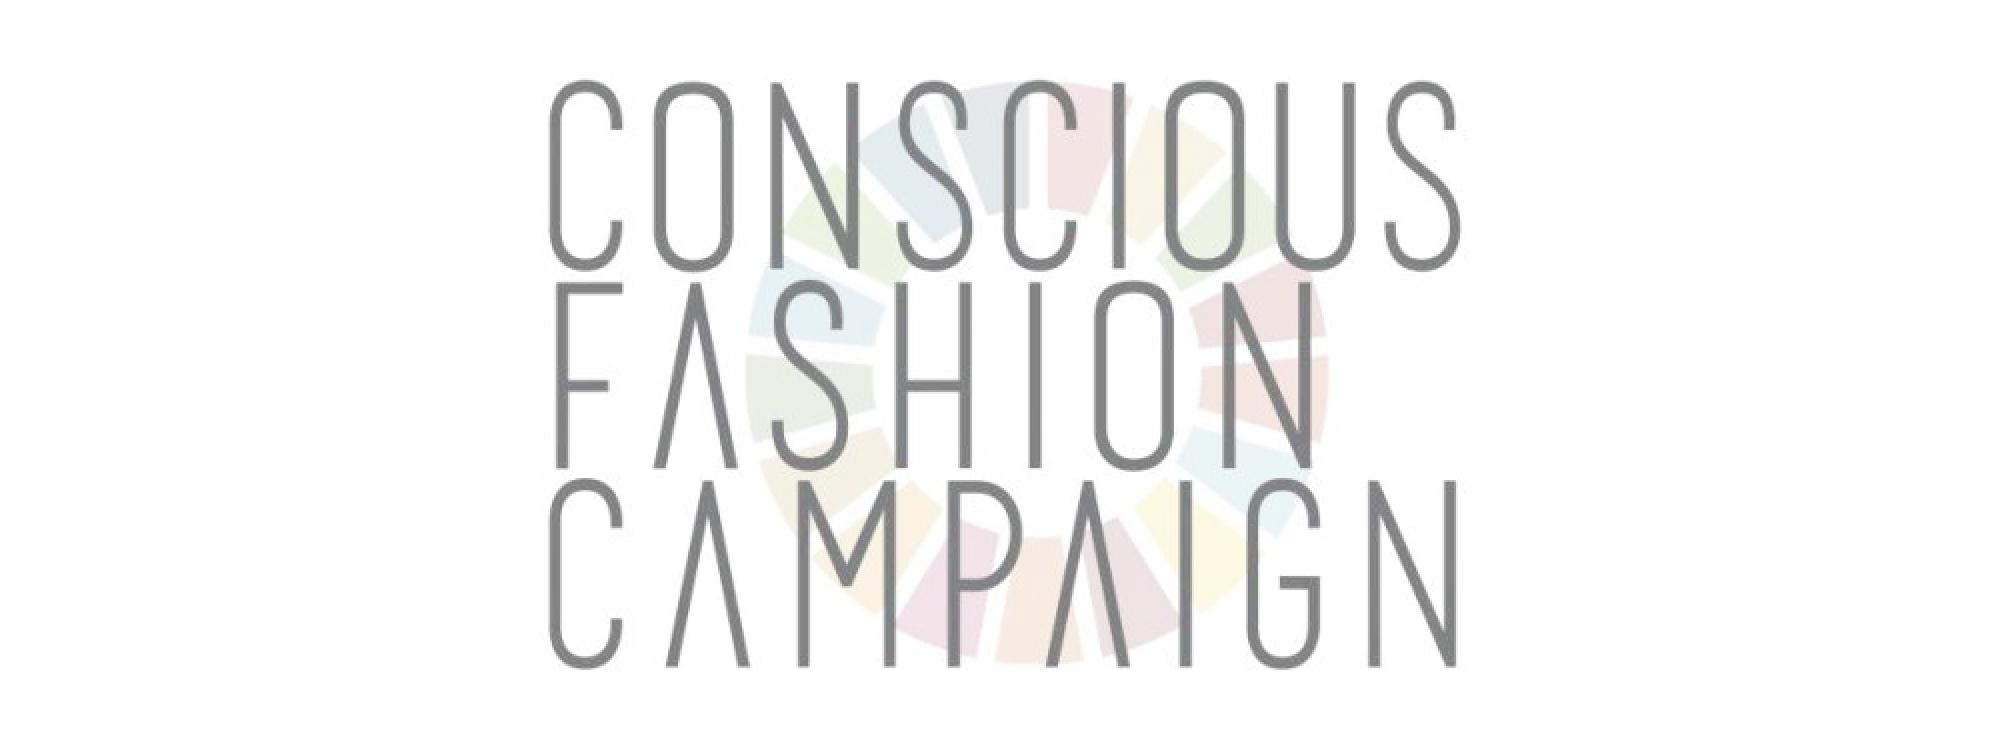 conscious campaign.jpg